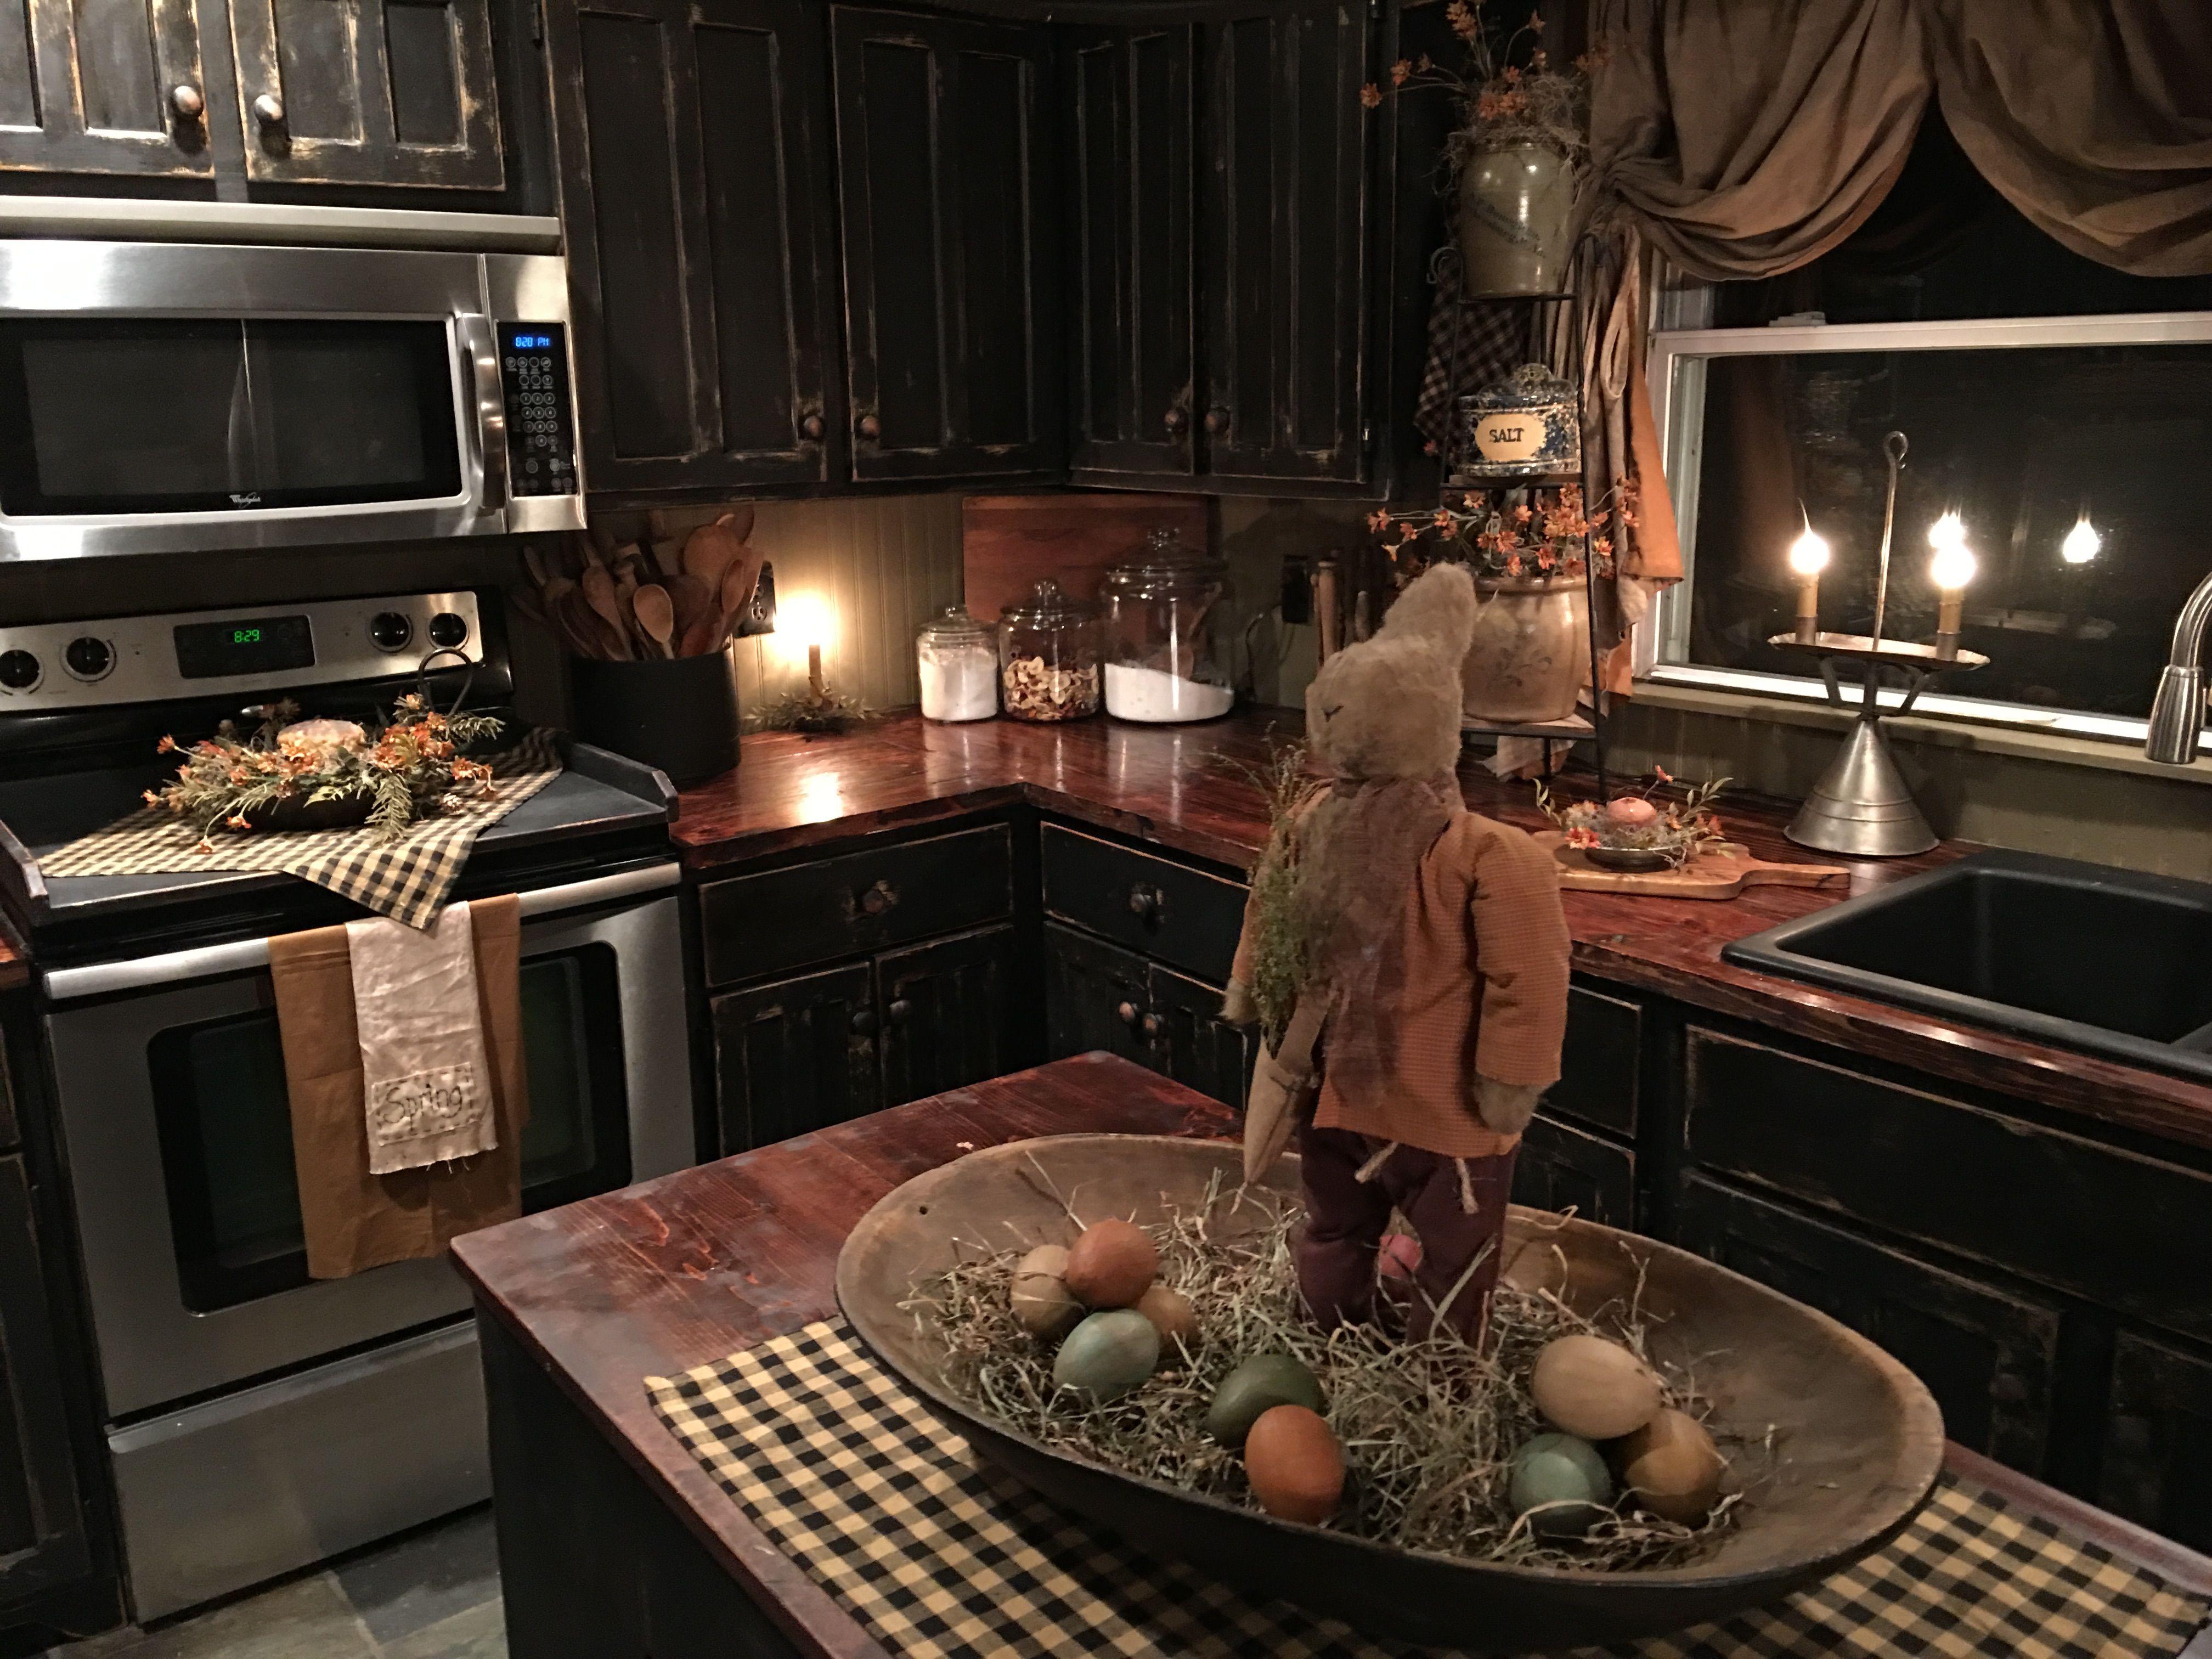 Primitive Home Decor For Kitchen: Primitive Home Decor